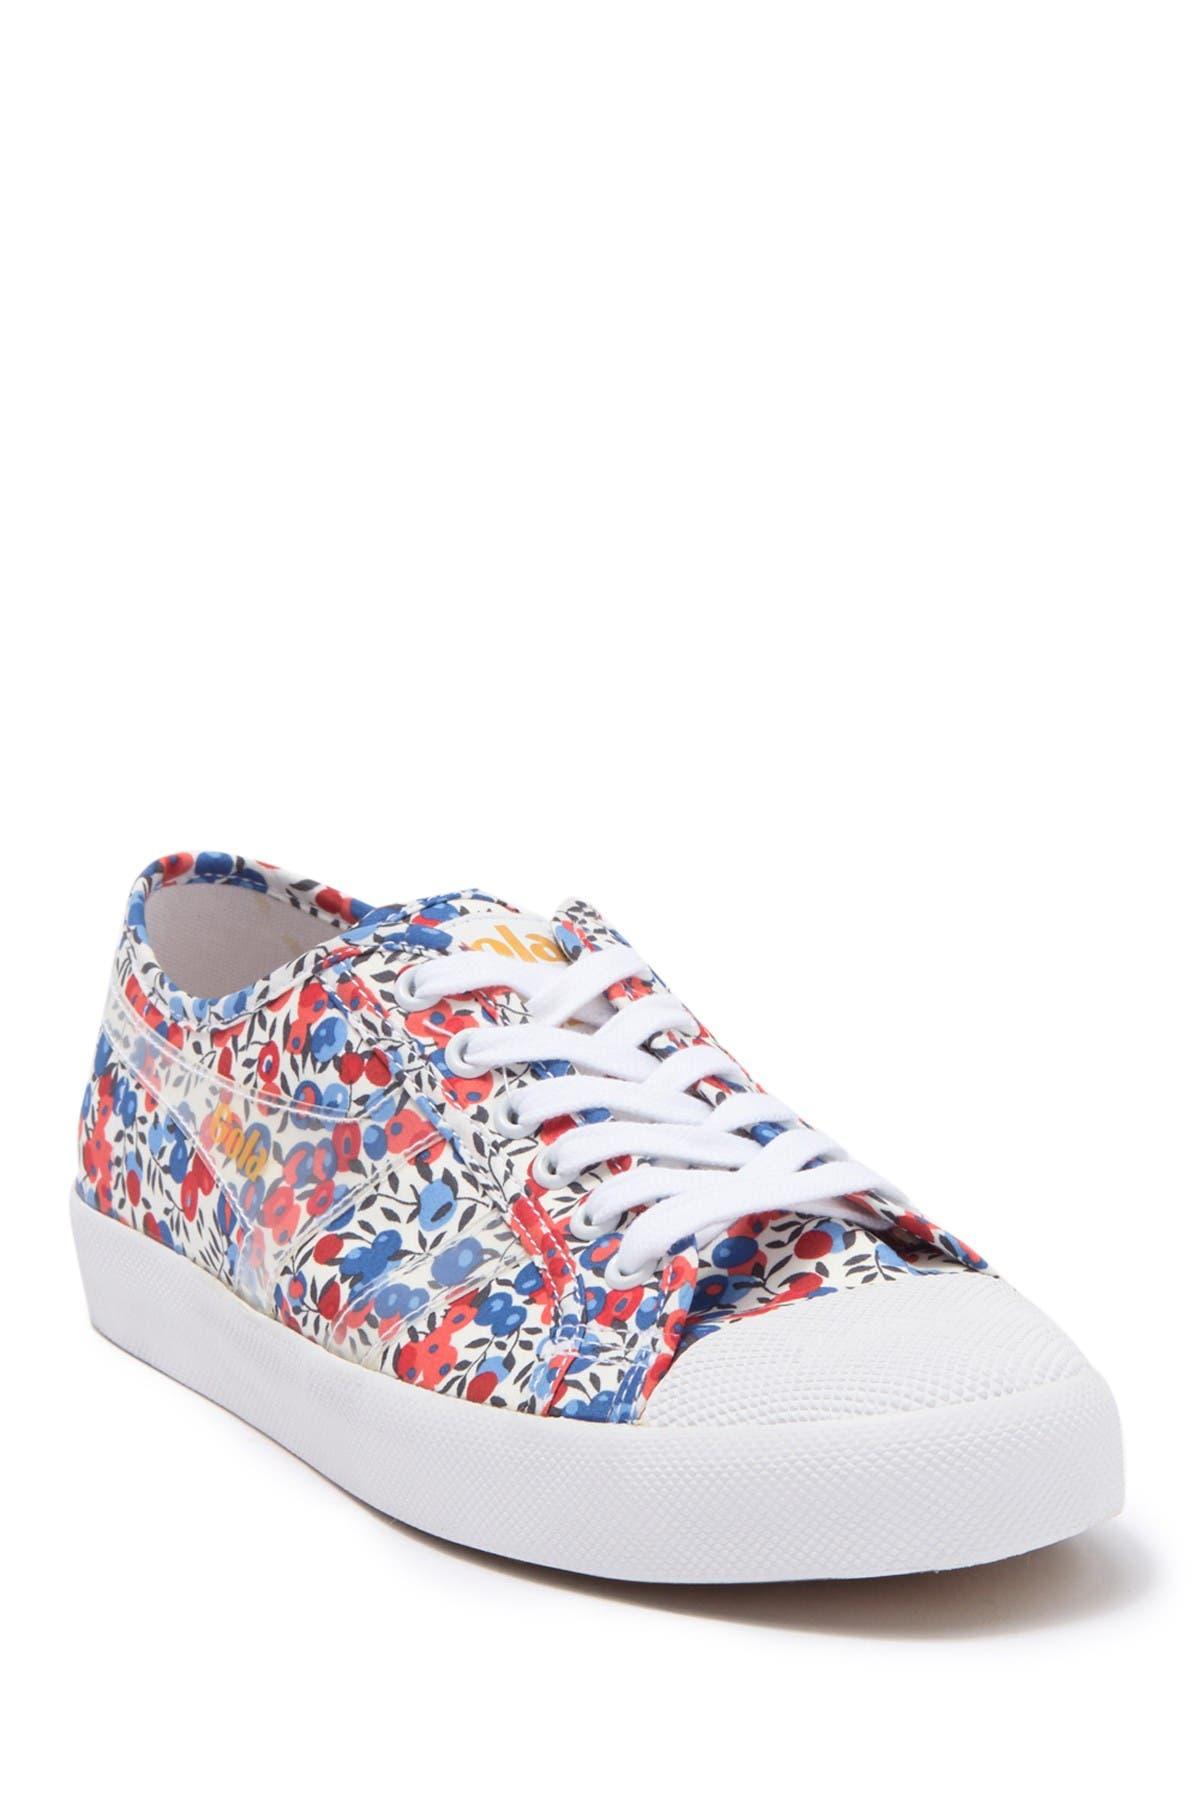 Image of Gola Coaster Wiltsher Sneaker